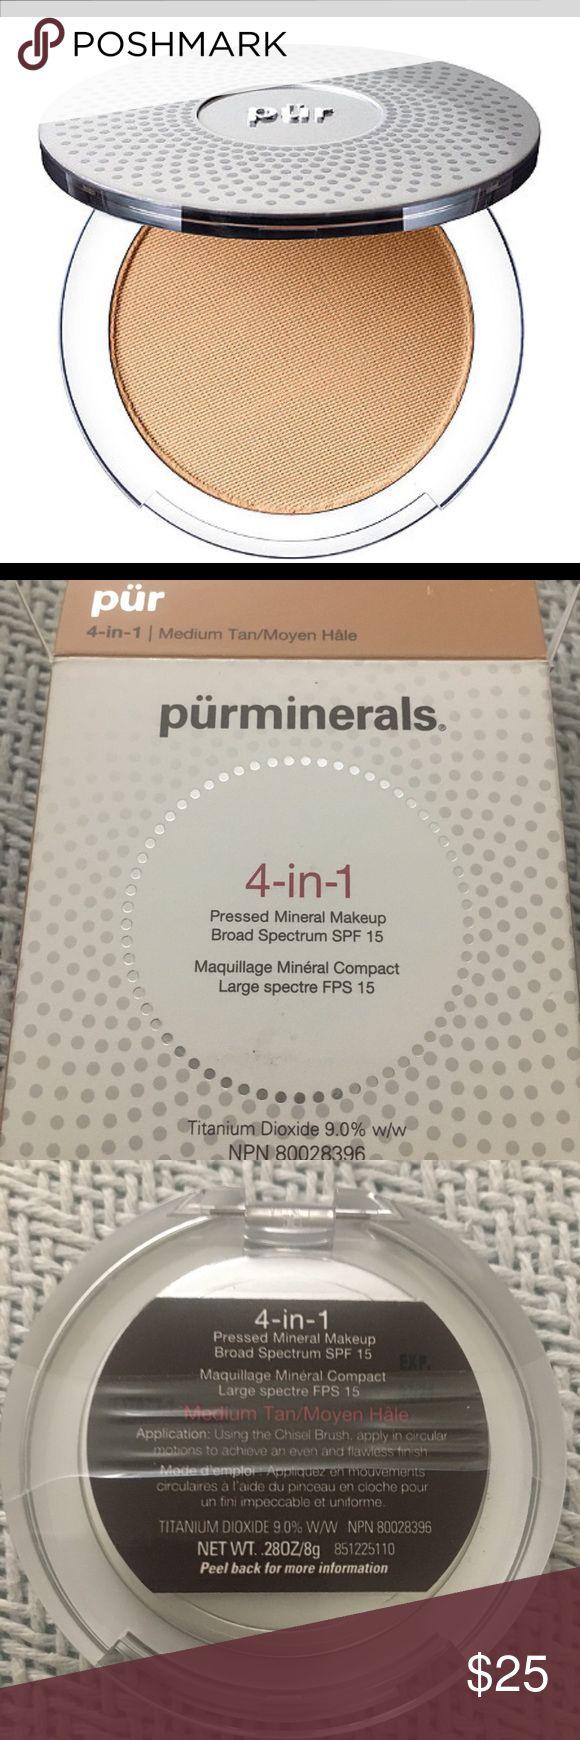 Brand New Pur Minerals Powder Foundation NWT Mineral